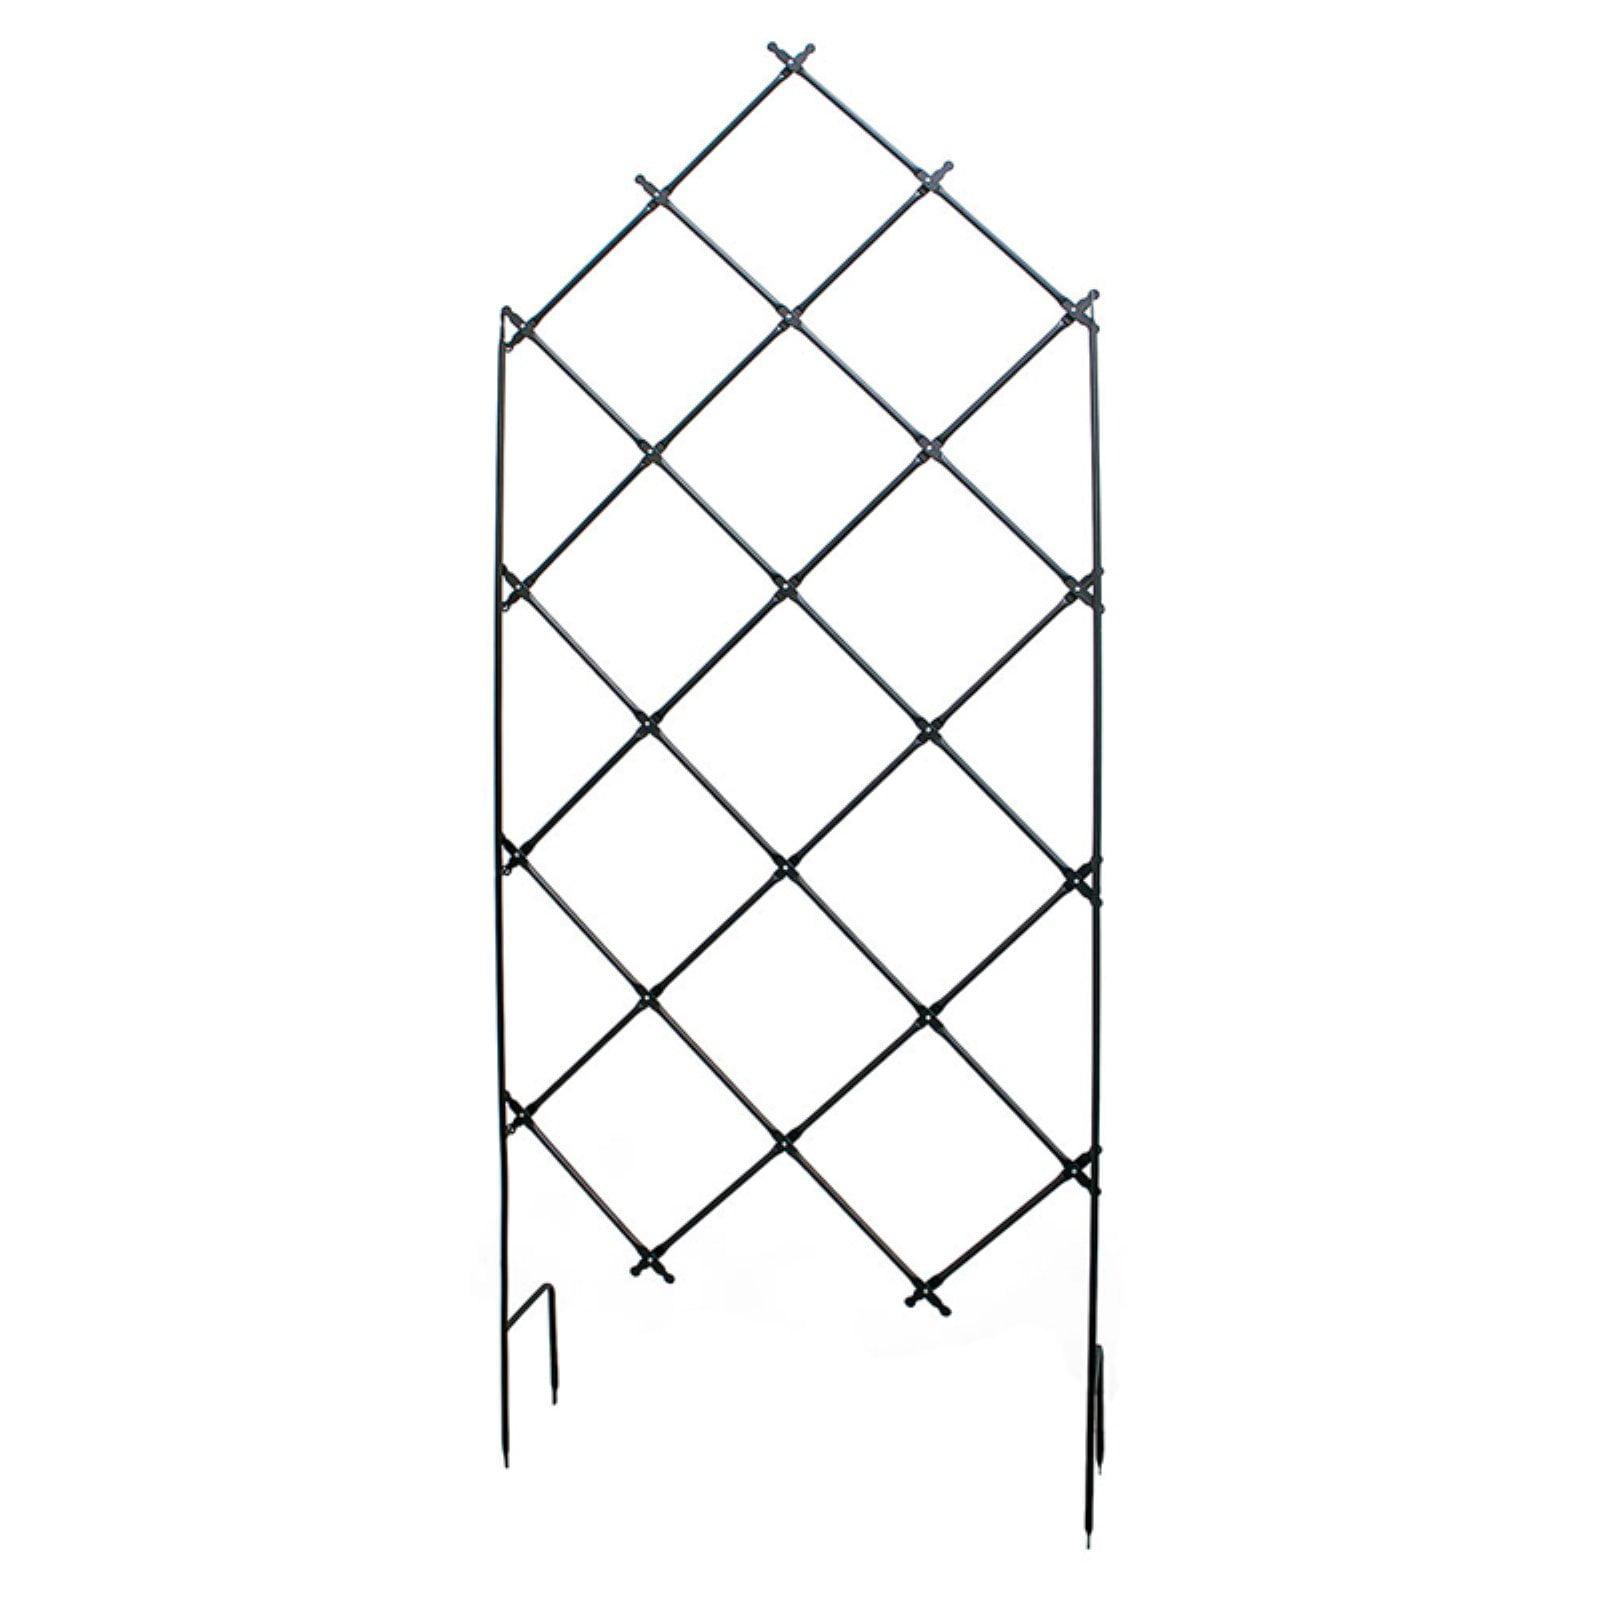 Achla Designs Lattice Trellis Free Standing